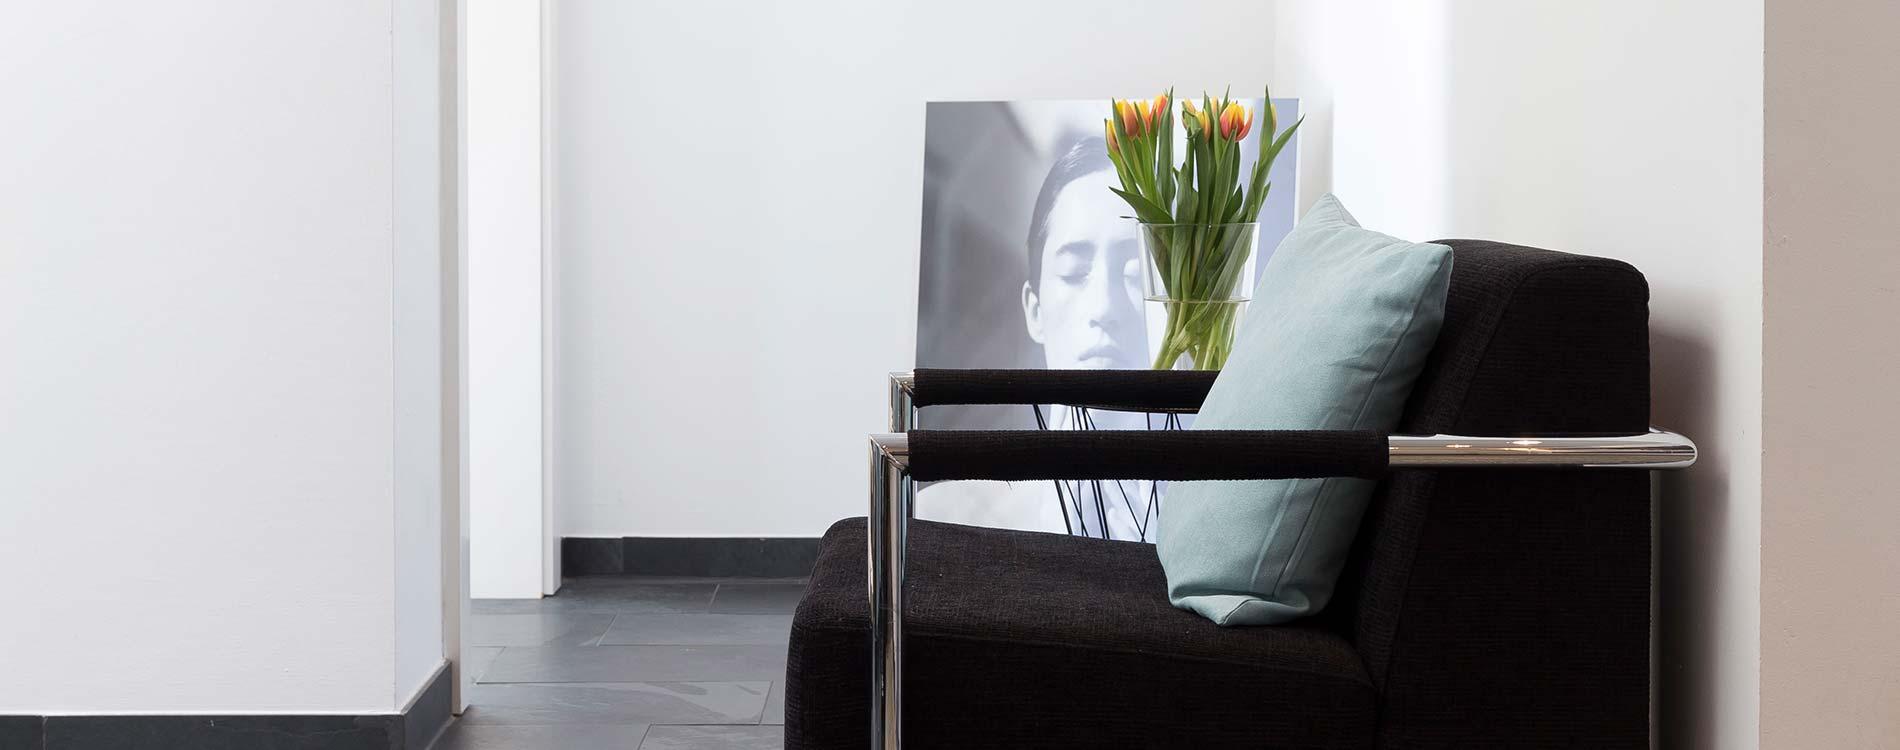 Behandlungen PROSPA Kosmetik Imst Kosmetikstudio Oberland Über uns